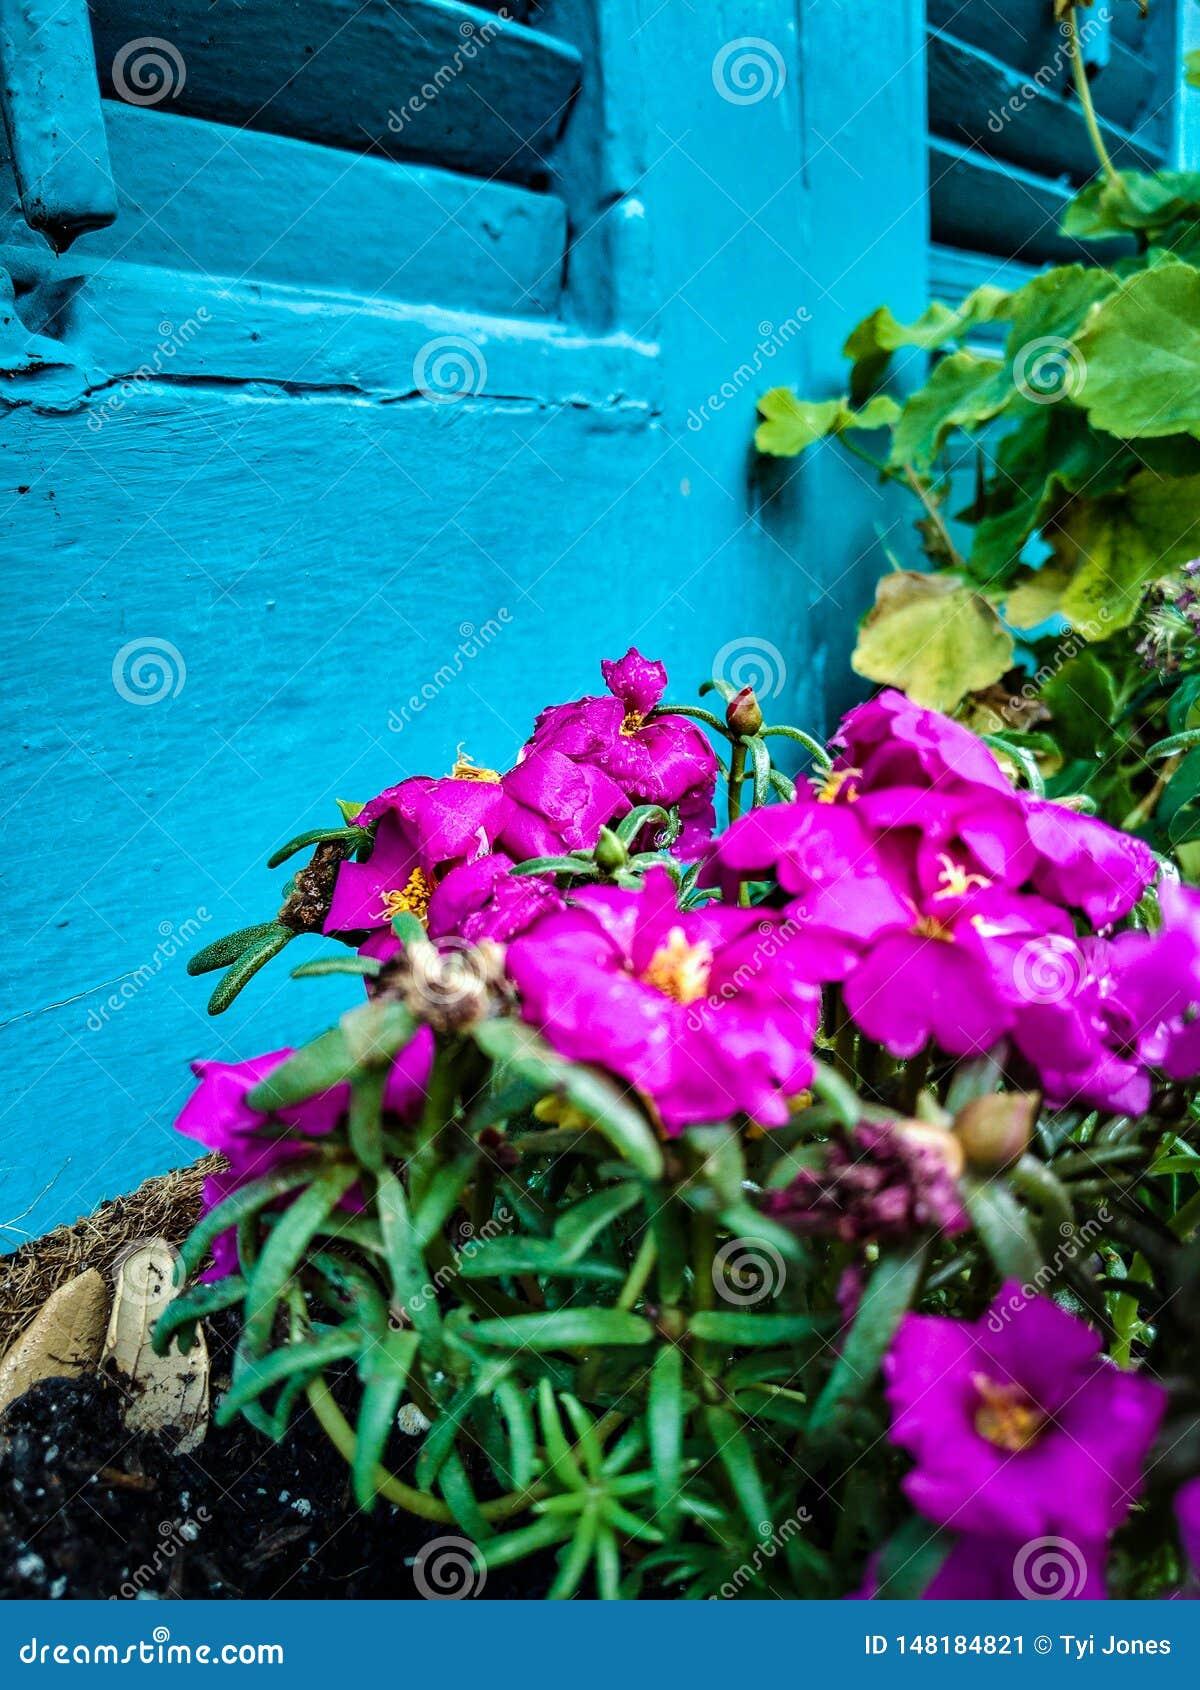 Pink Flowers against Blue Shudders